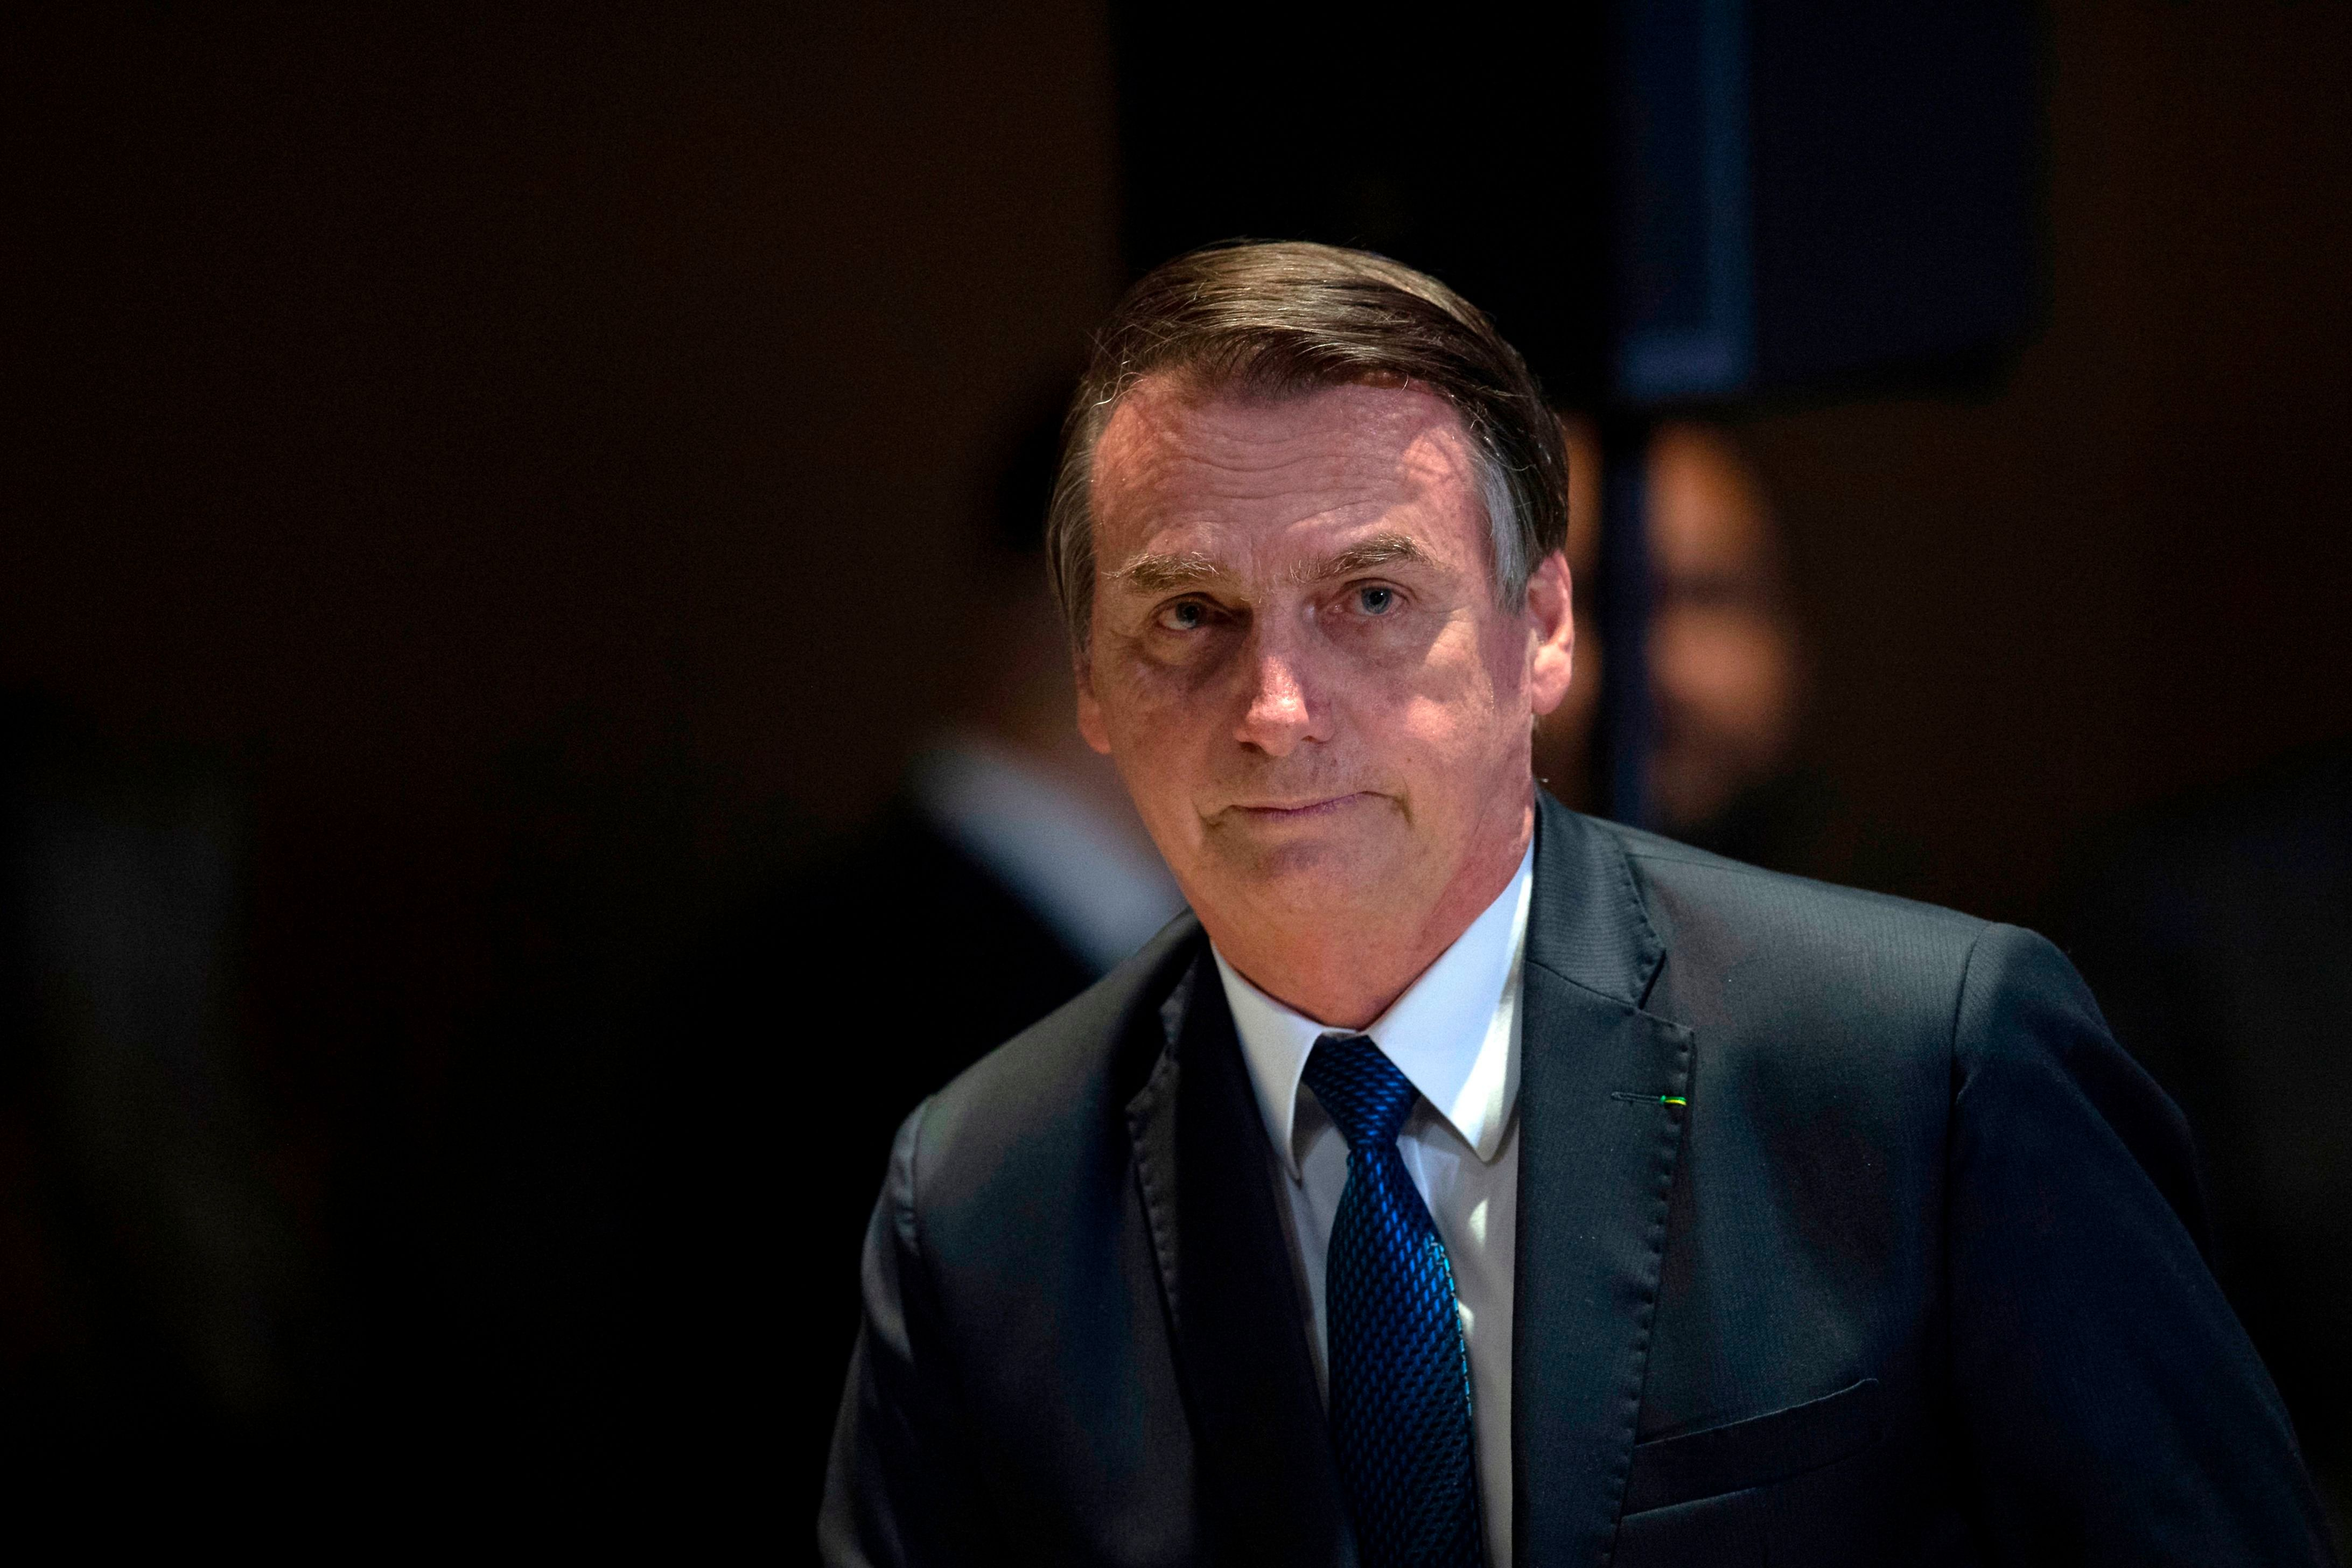 Após silêncio, Bolsonaro chama 80 tiros de 'incidente' e defende